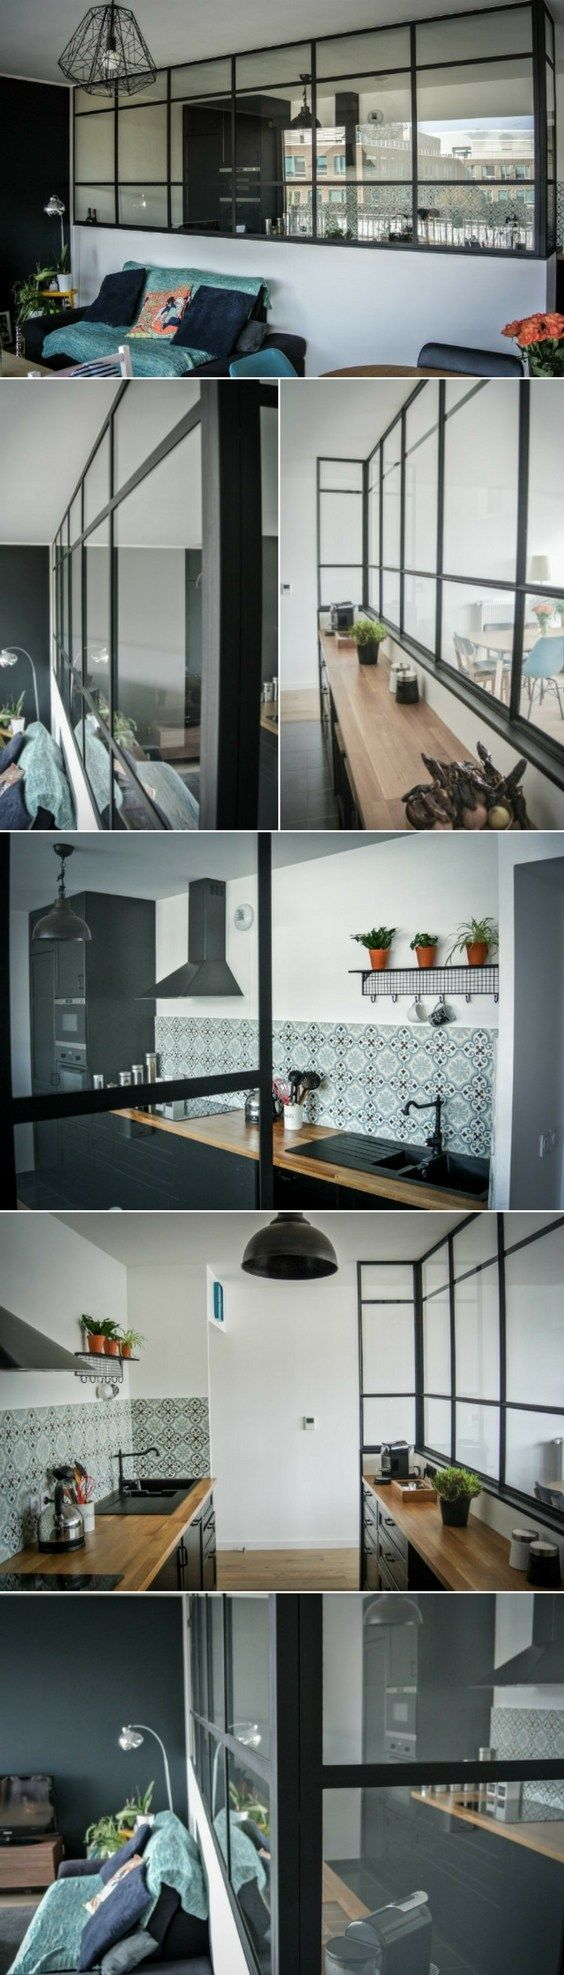 idee deco verriere interieure good une verrire duintrieur pour agrandir son espace with idee. Black Bedroom Furniture Sets. Home Design Ideas